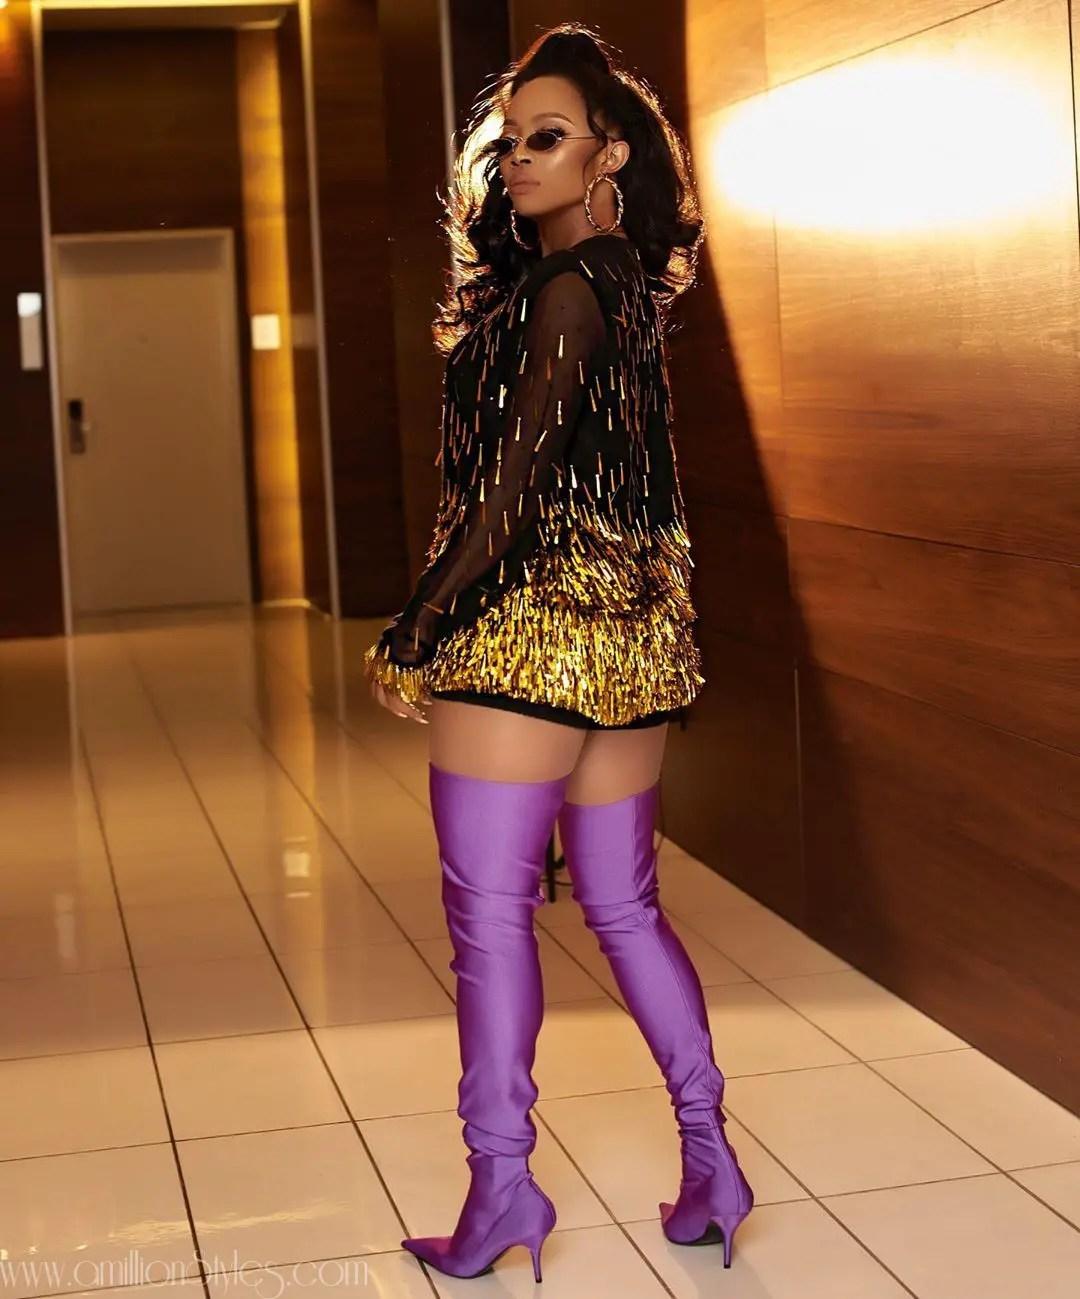 Who Wore This Lanre Da Silva Dress Better? Toke Makinwa Or Ini Dima Okogie